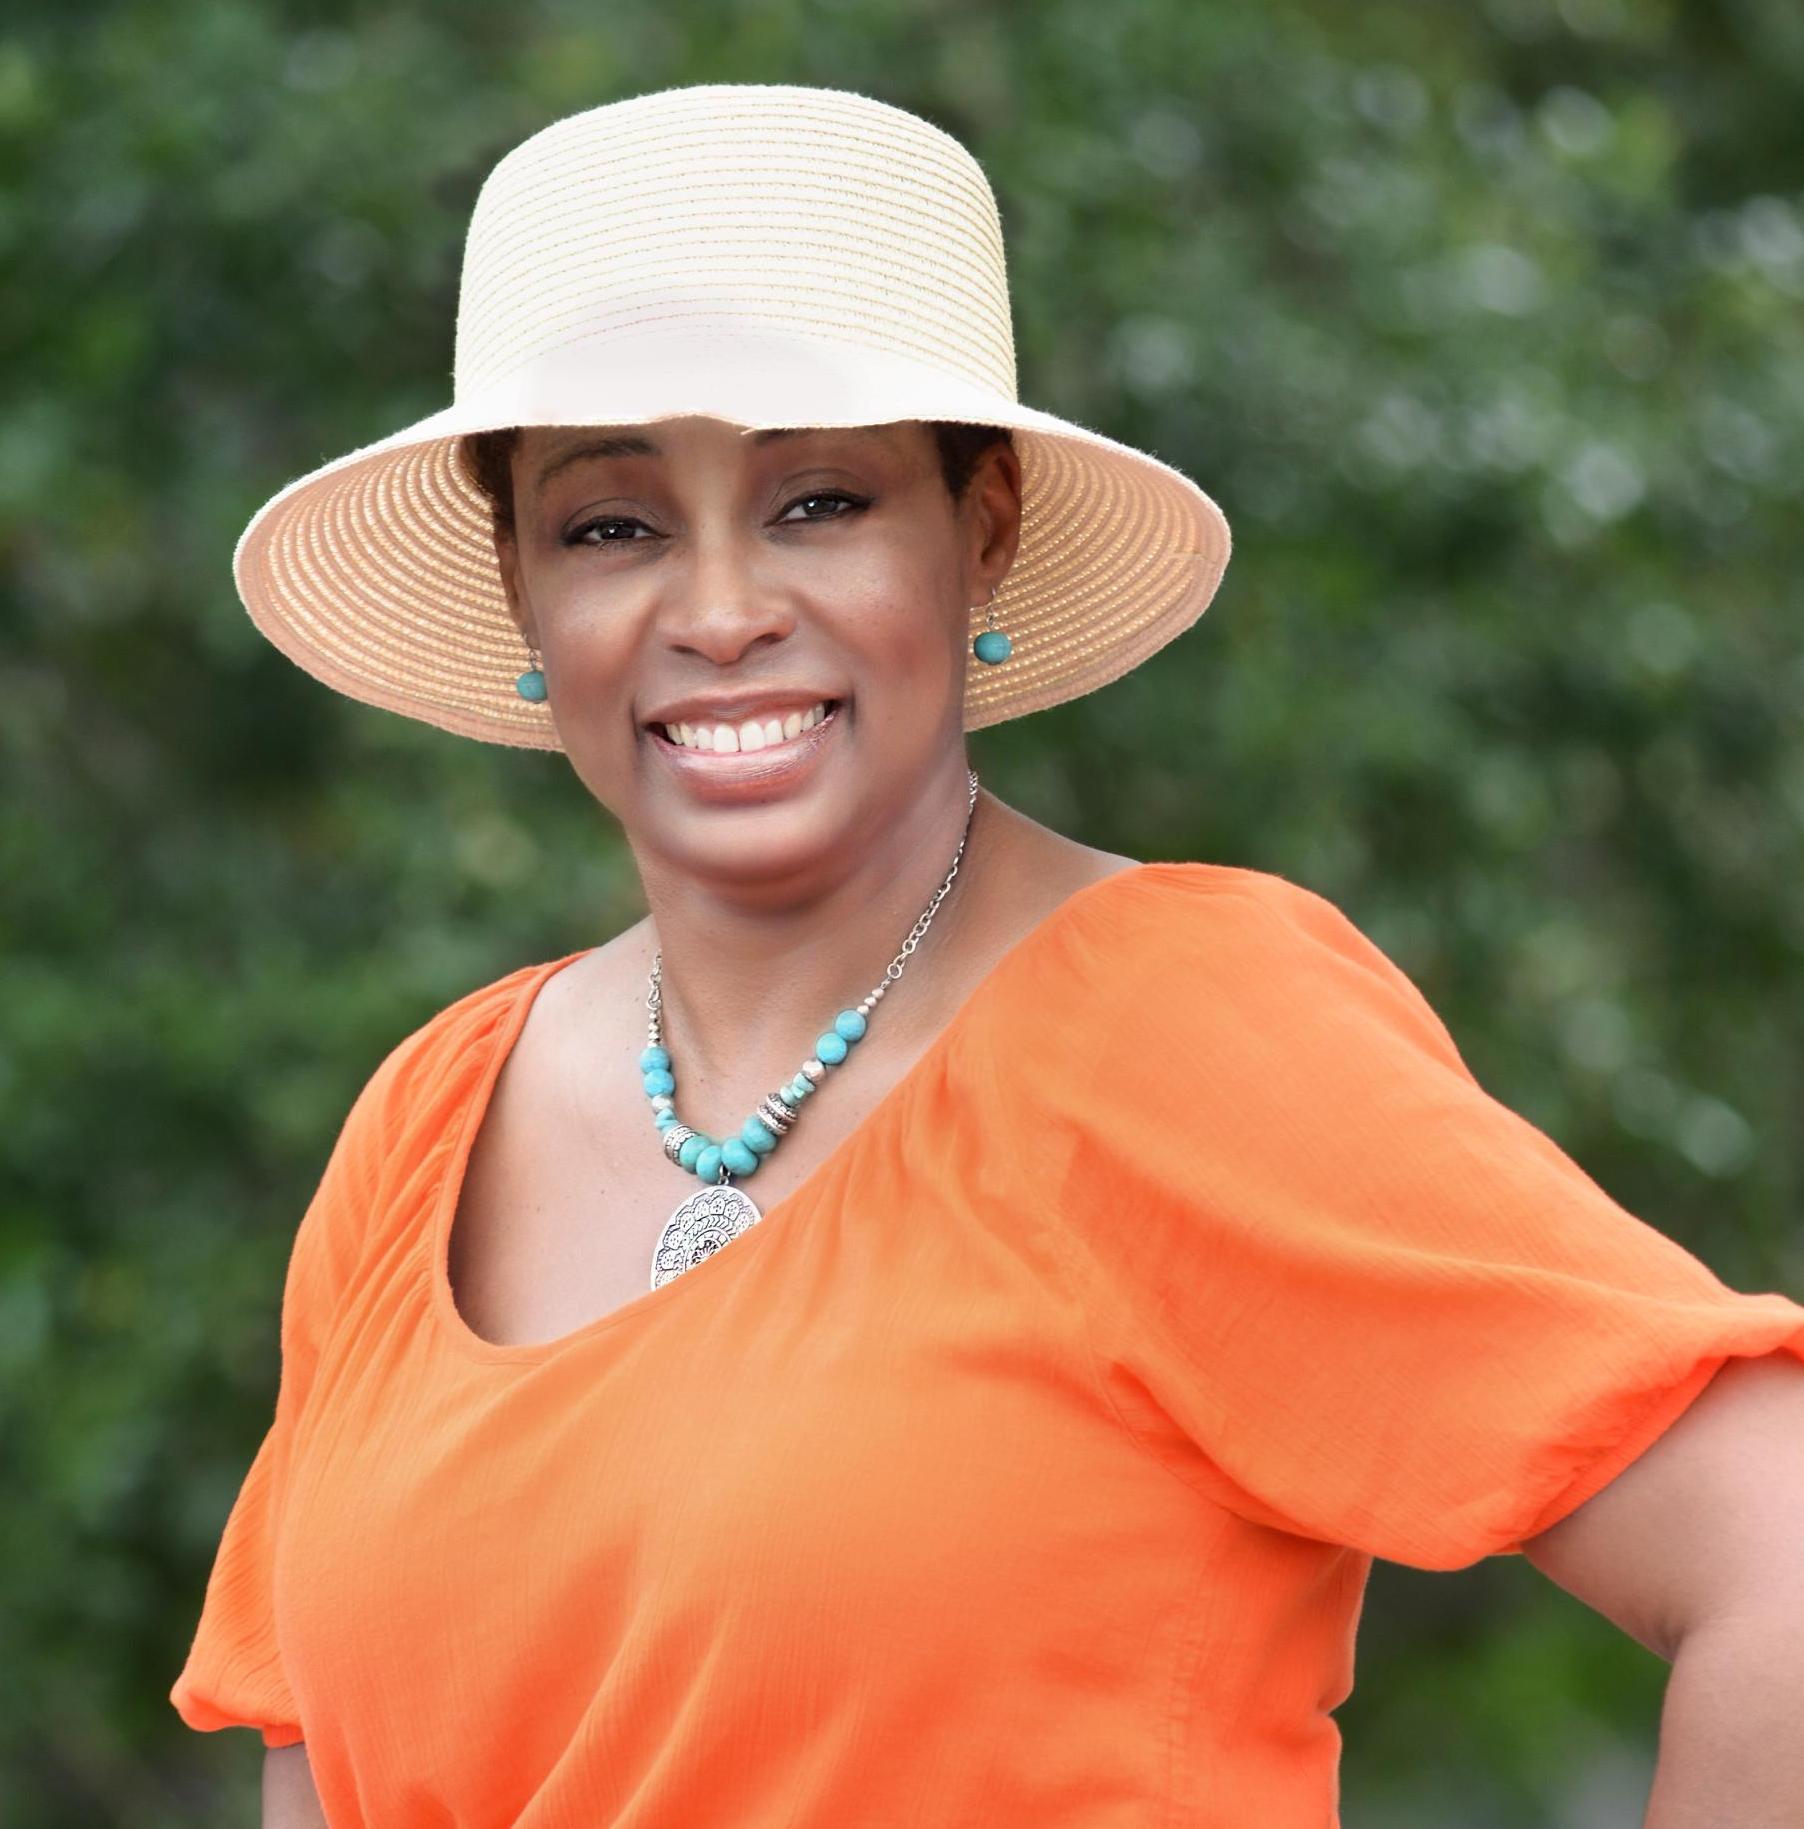 Janice Goodwin